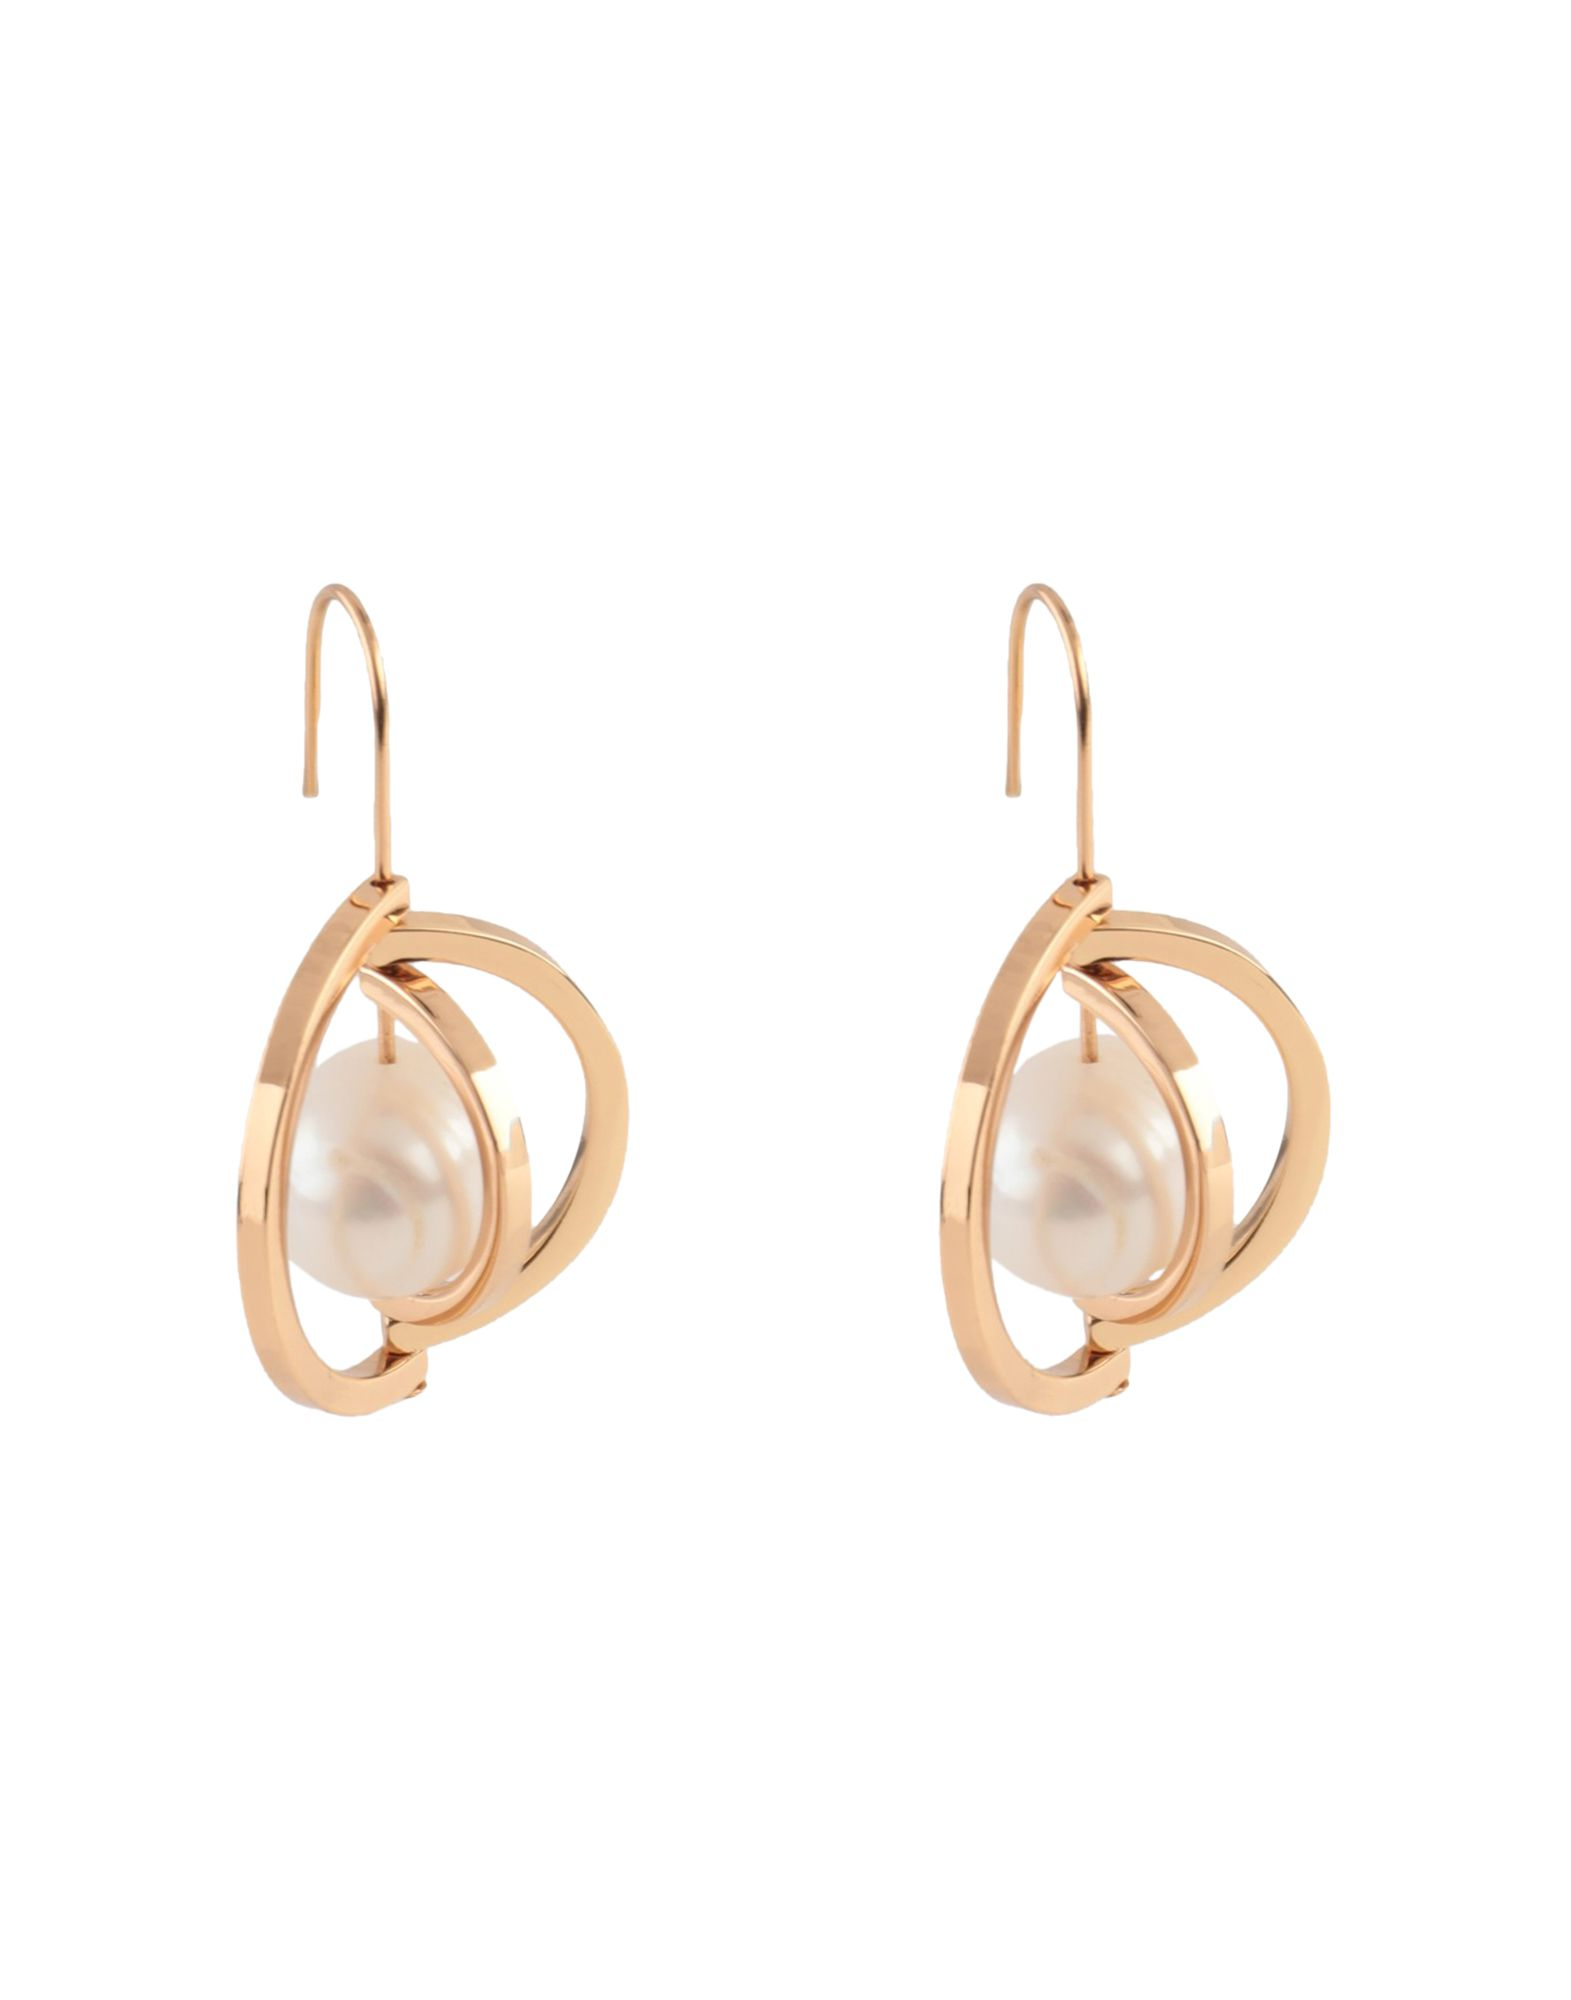 TORY BURCH Earrings - Item 50245328